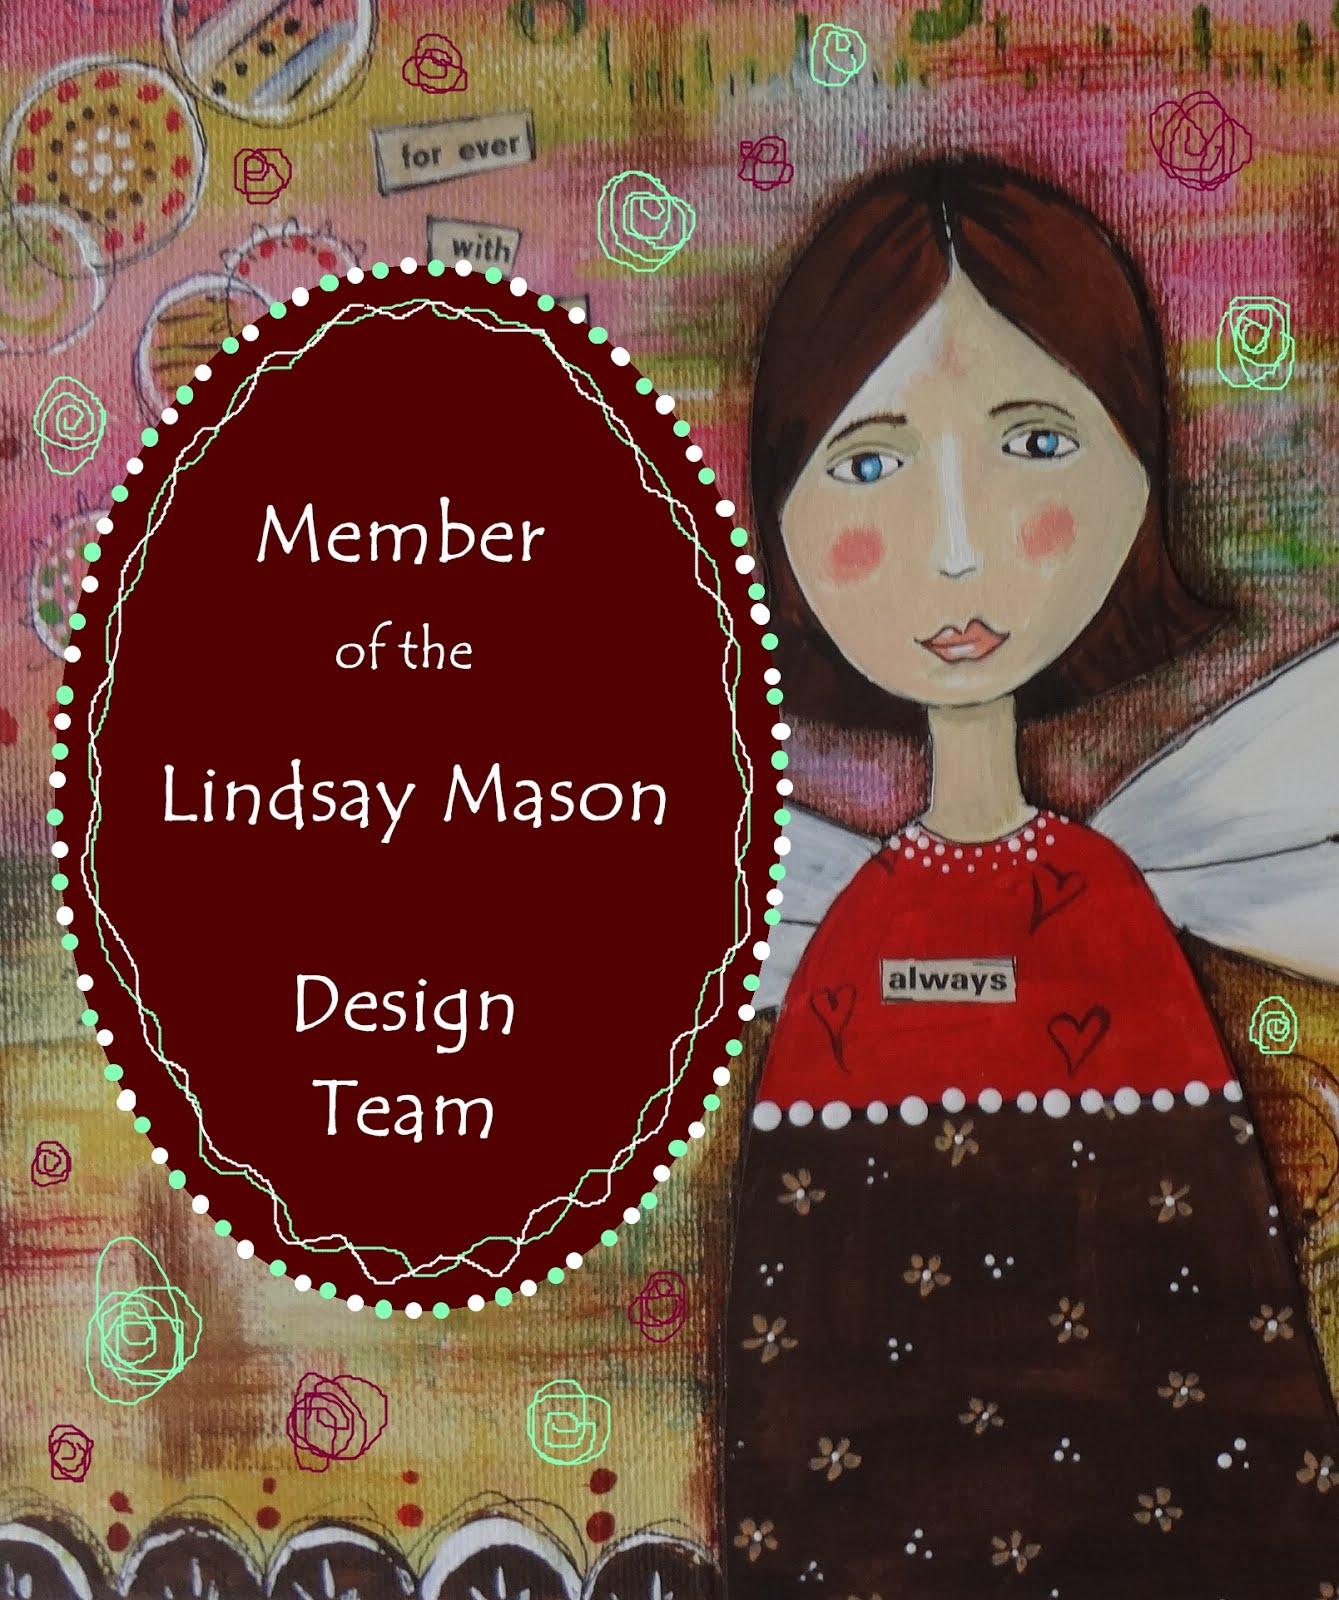 Design Team Member.